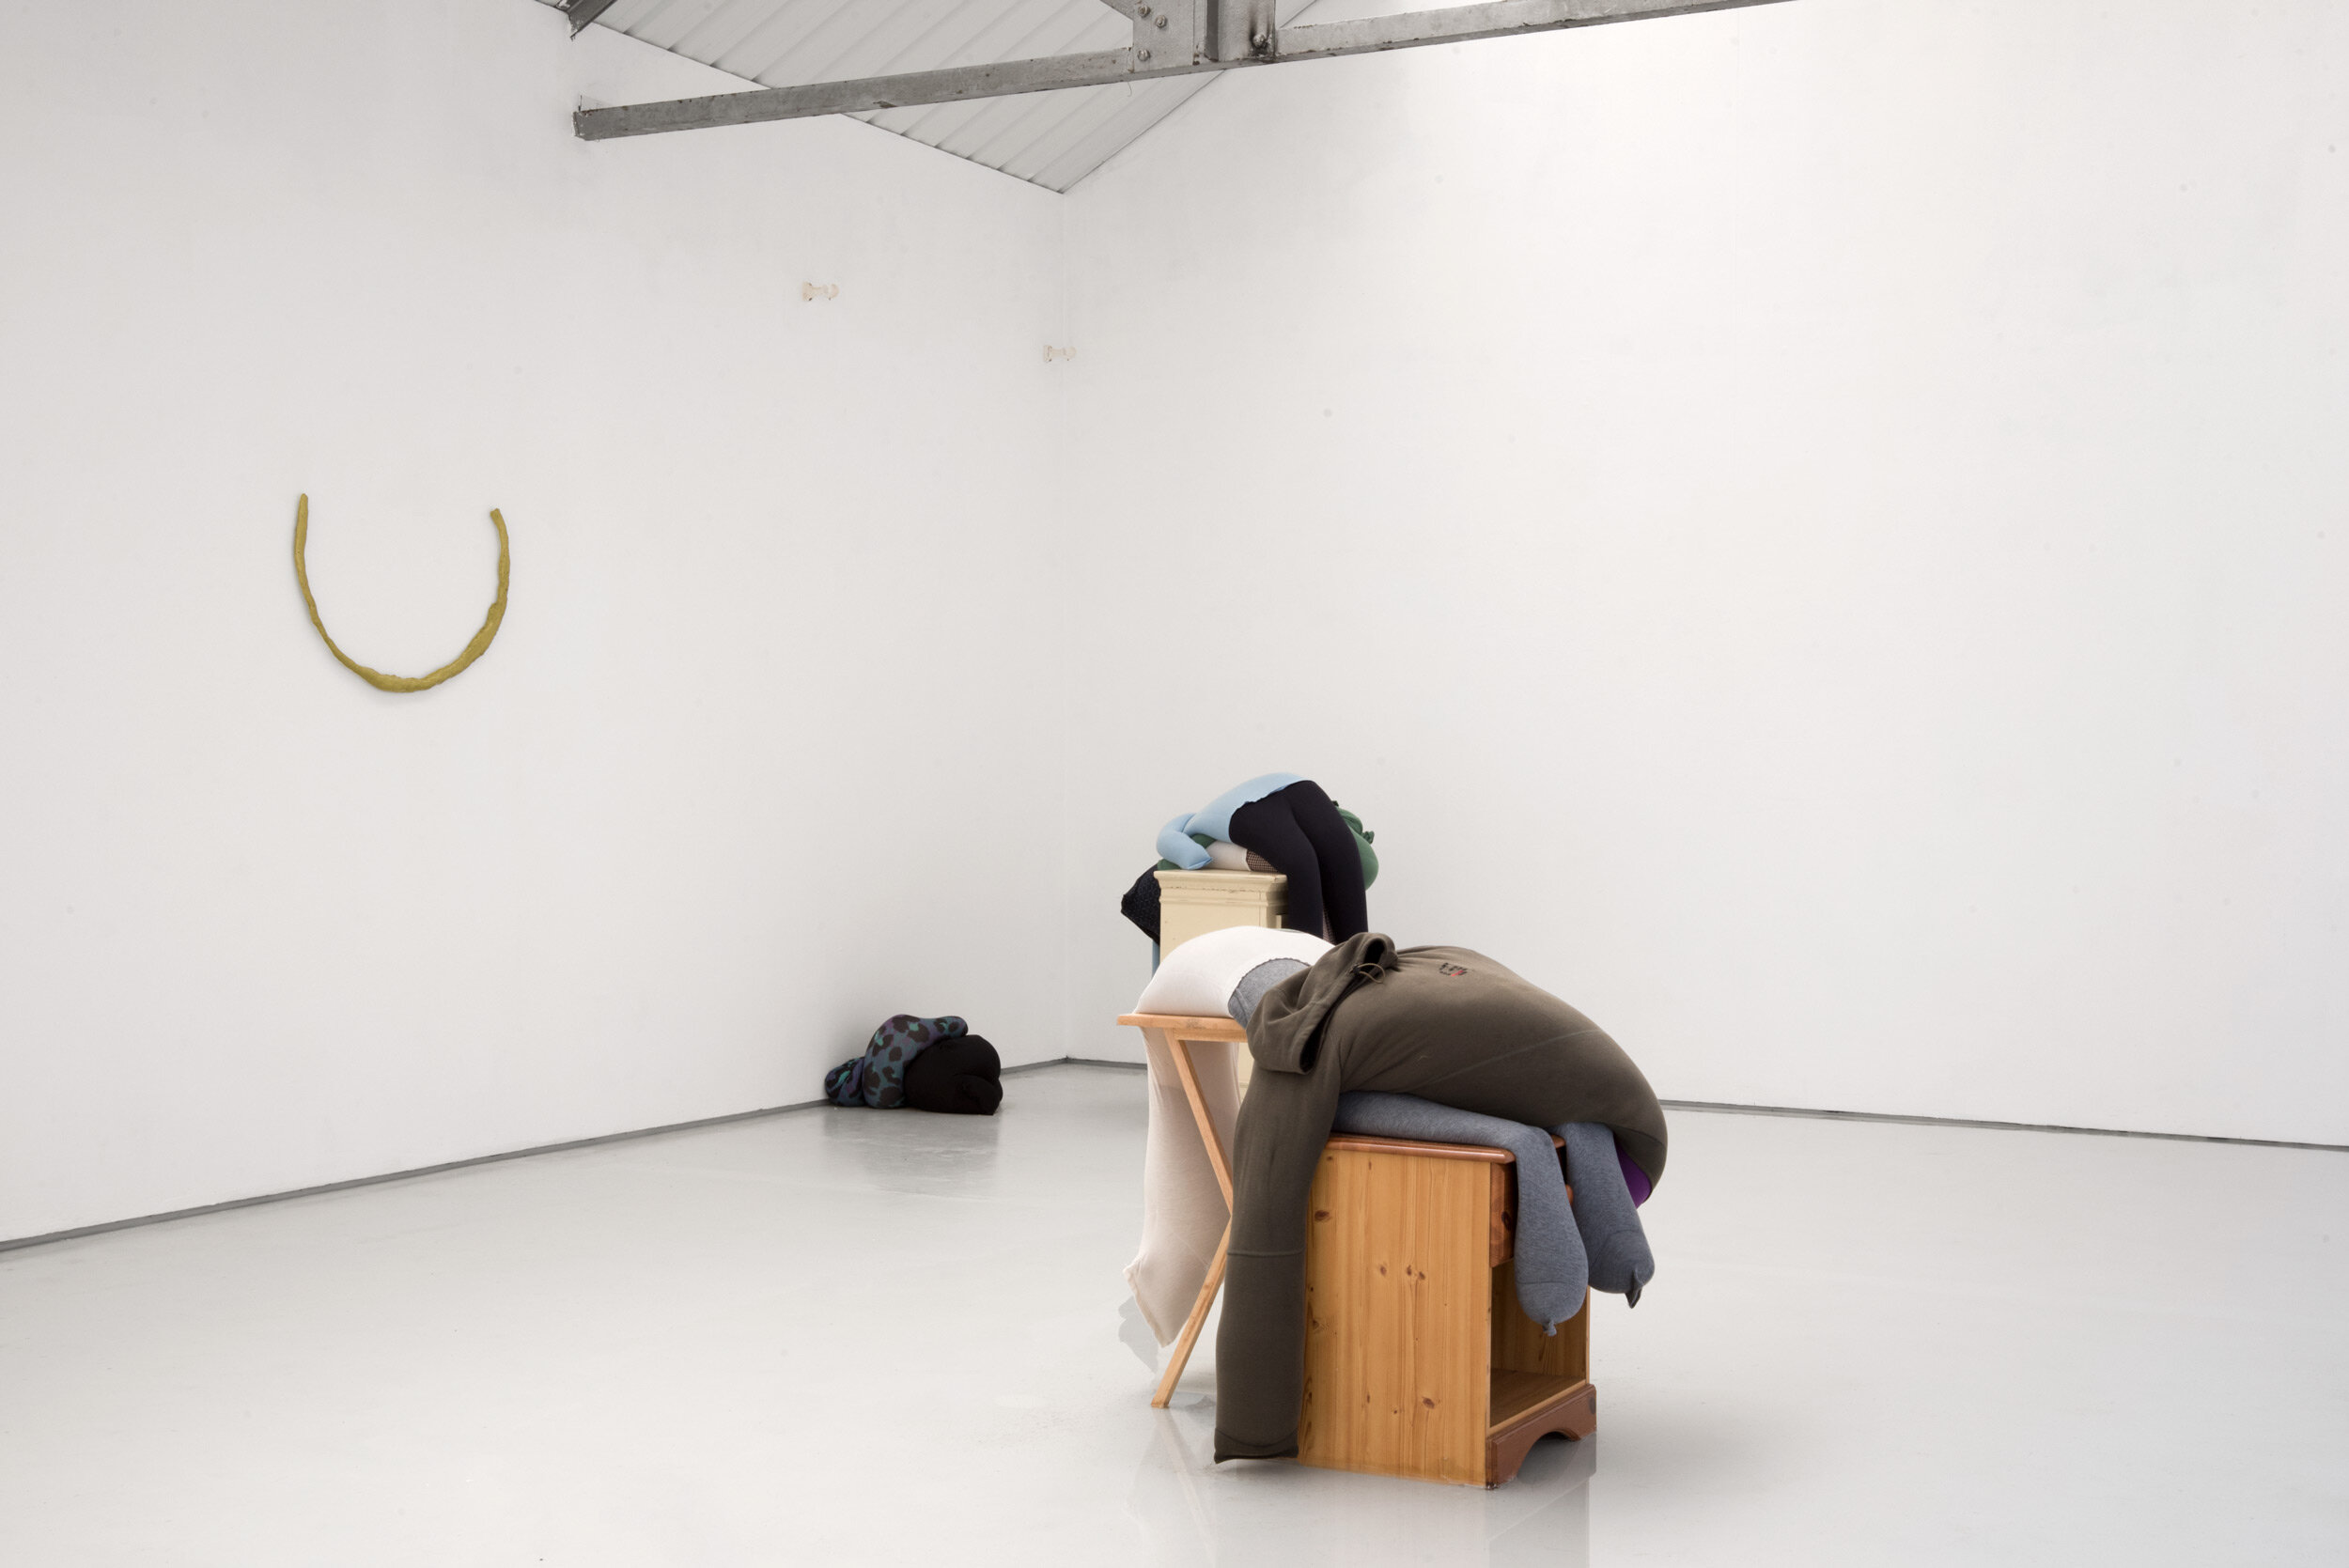 Fall, slump, drop on a bedside cabinet in water[...], Installation View, Alex Farrar, Bloc Projects, 2019, 2.jpg